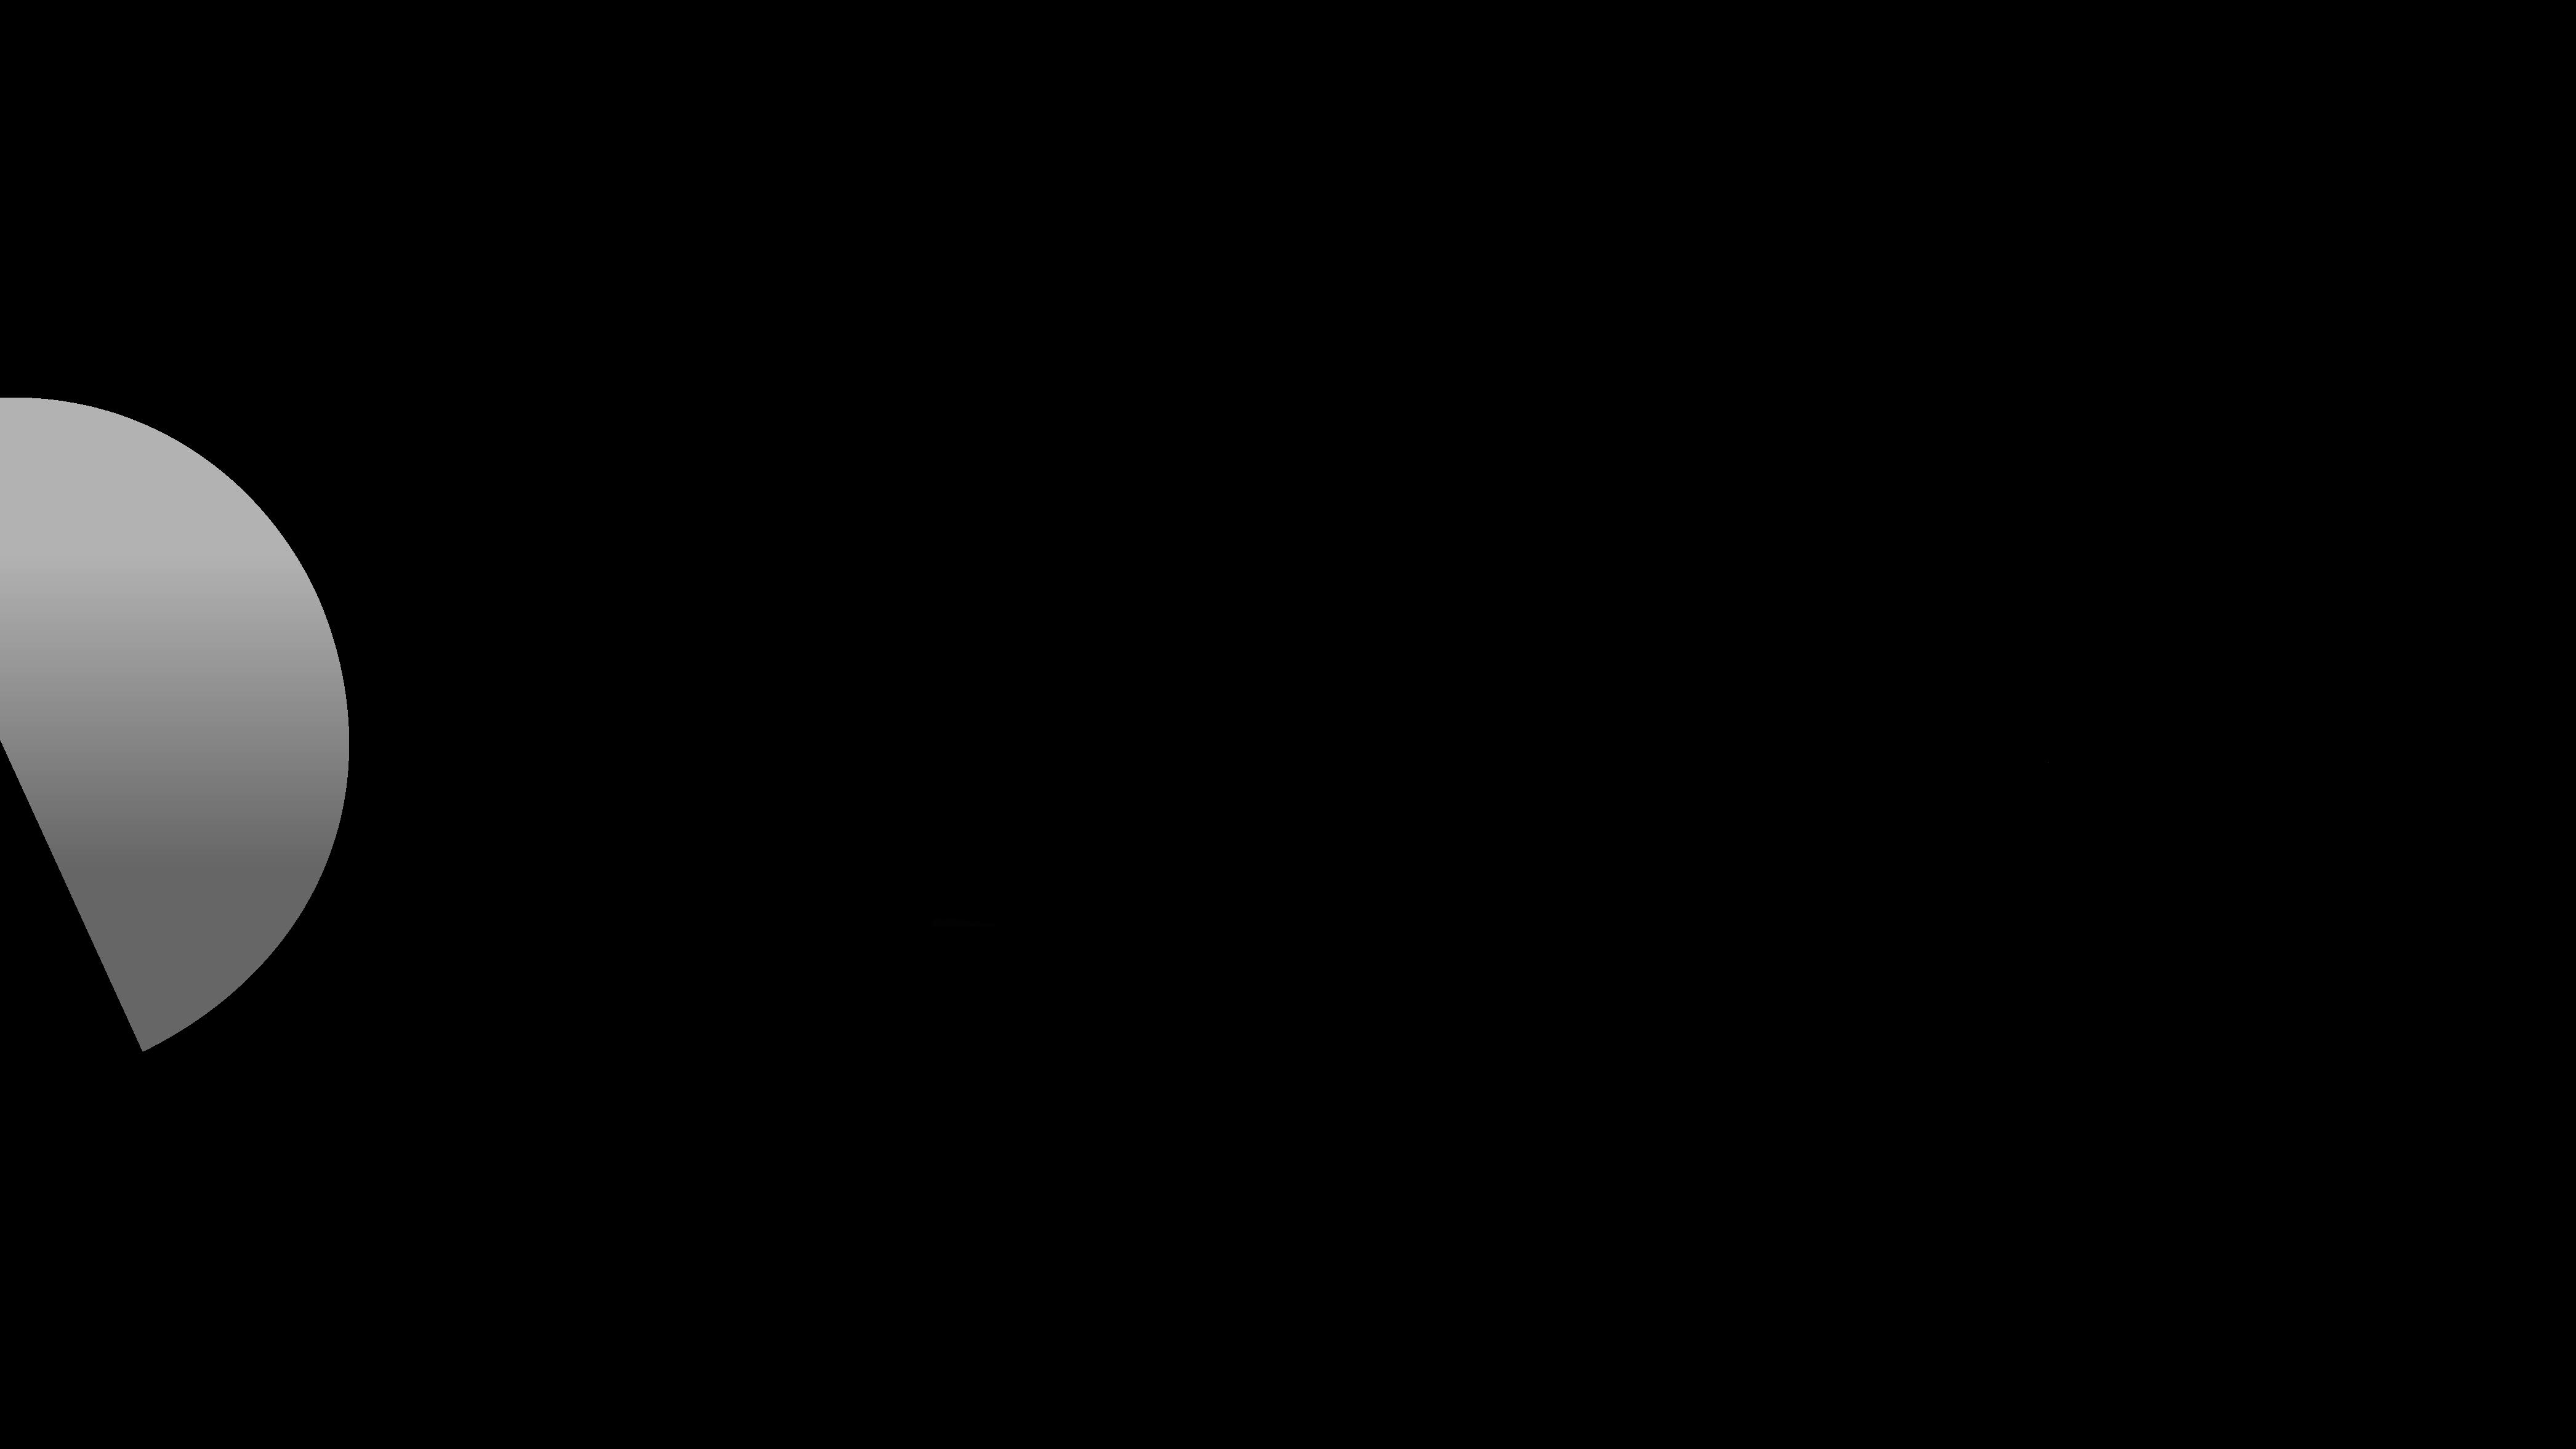 abclocal.alt.text.photo_A0_NAME_A1_CITY